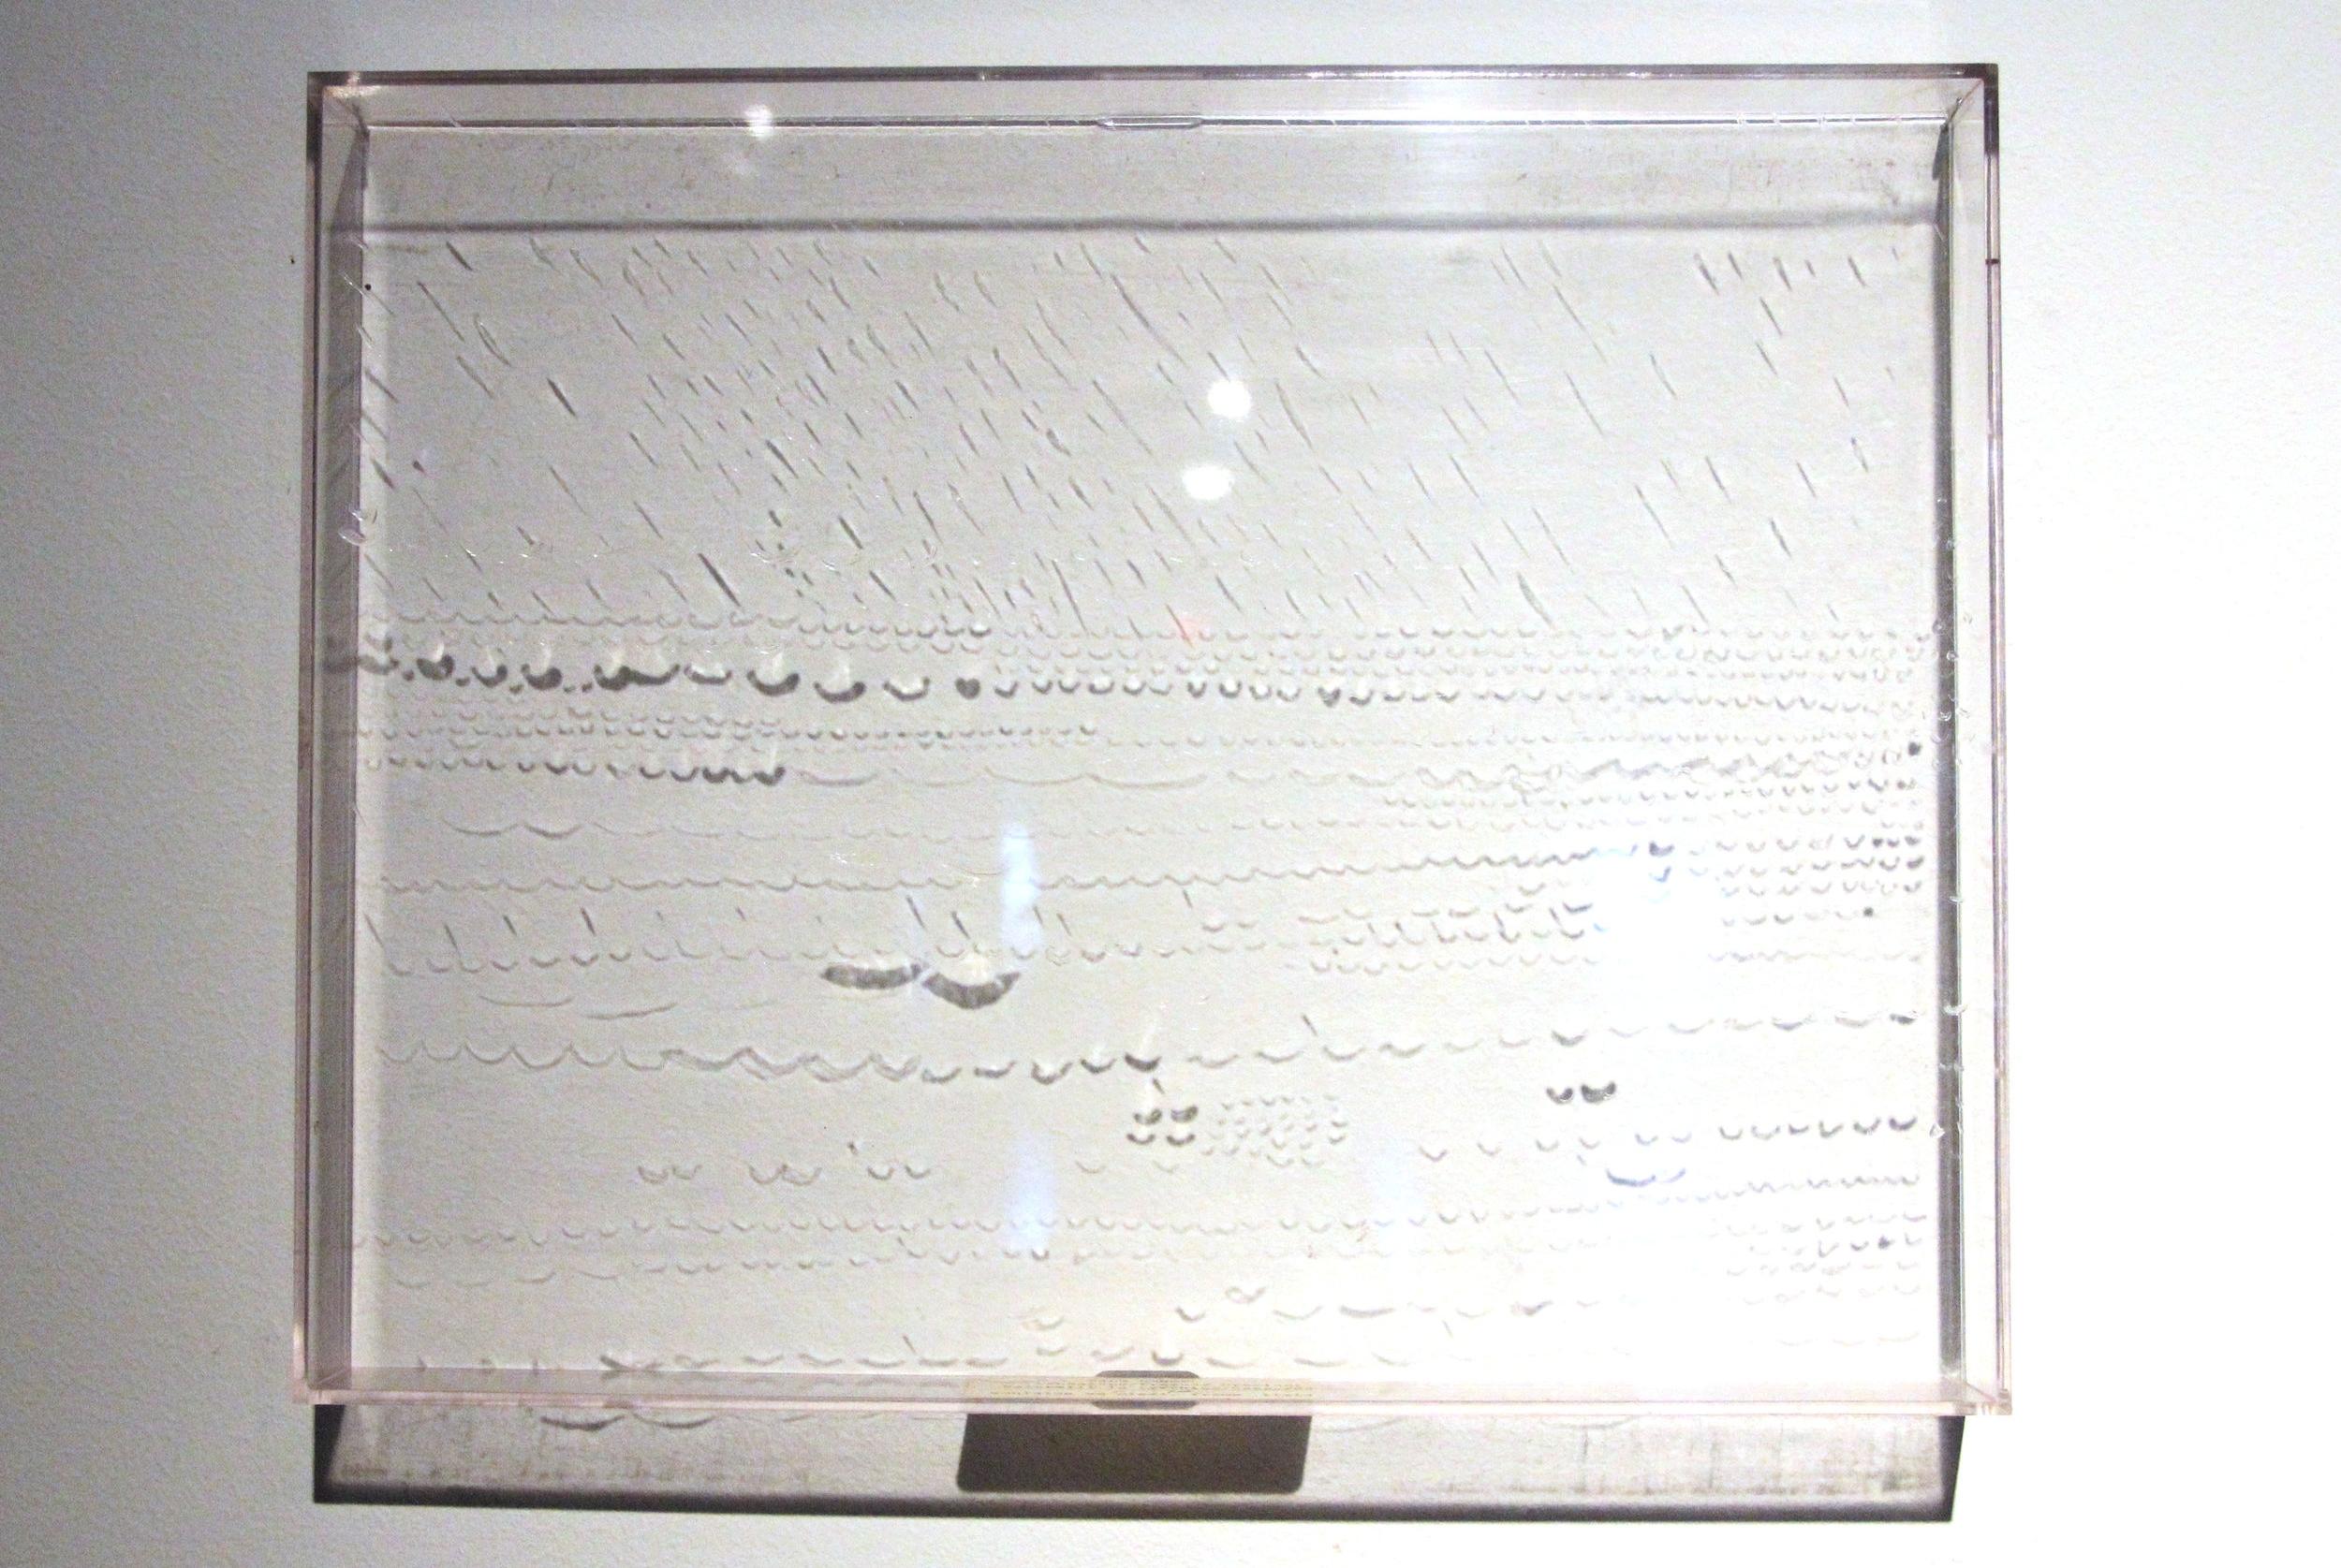 Prosody Drawings  series : Watermill in Pyrrhics/Caesuras , 1973